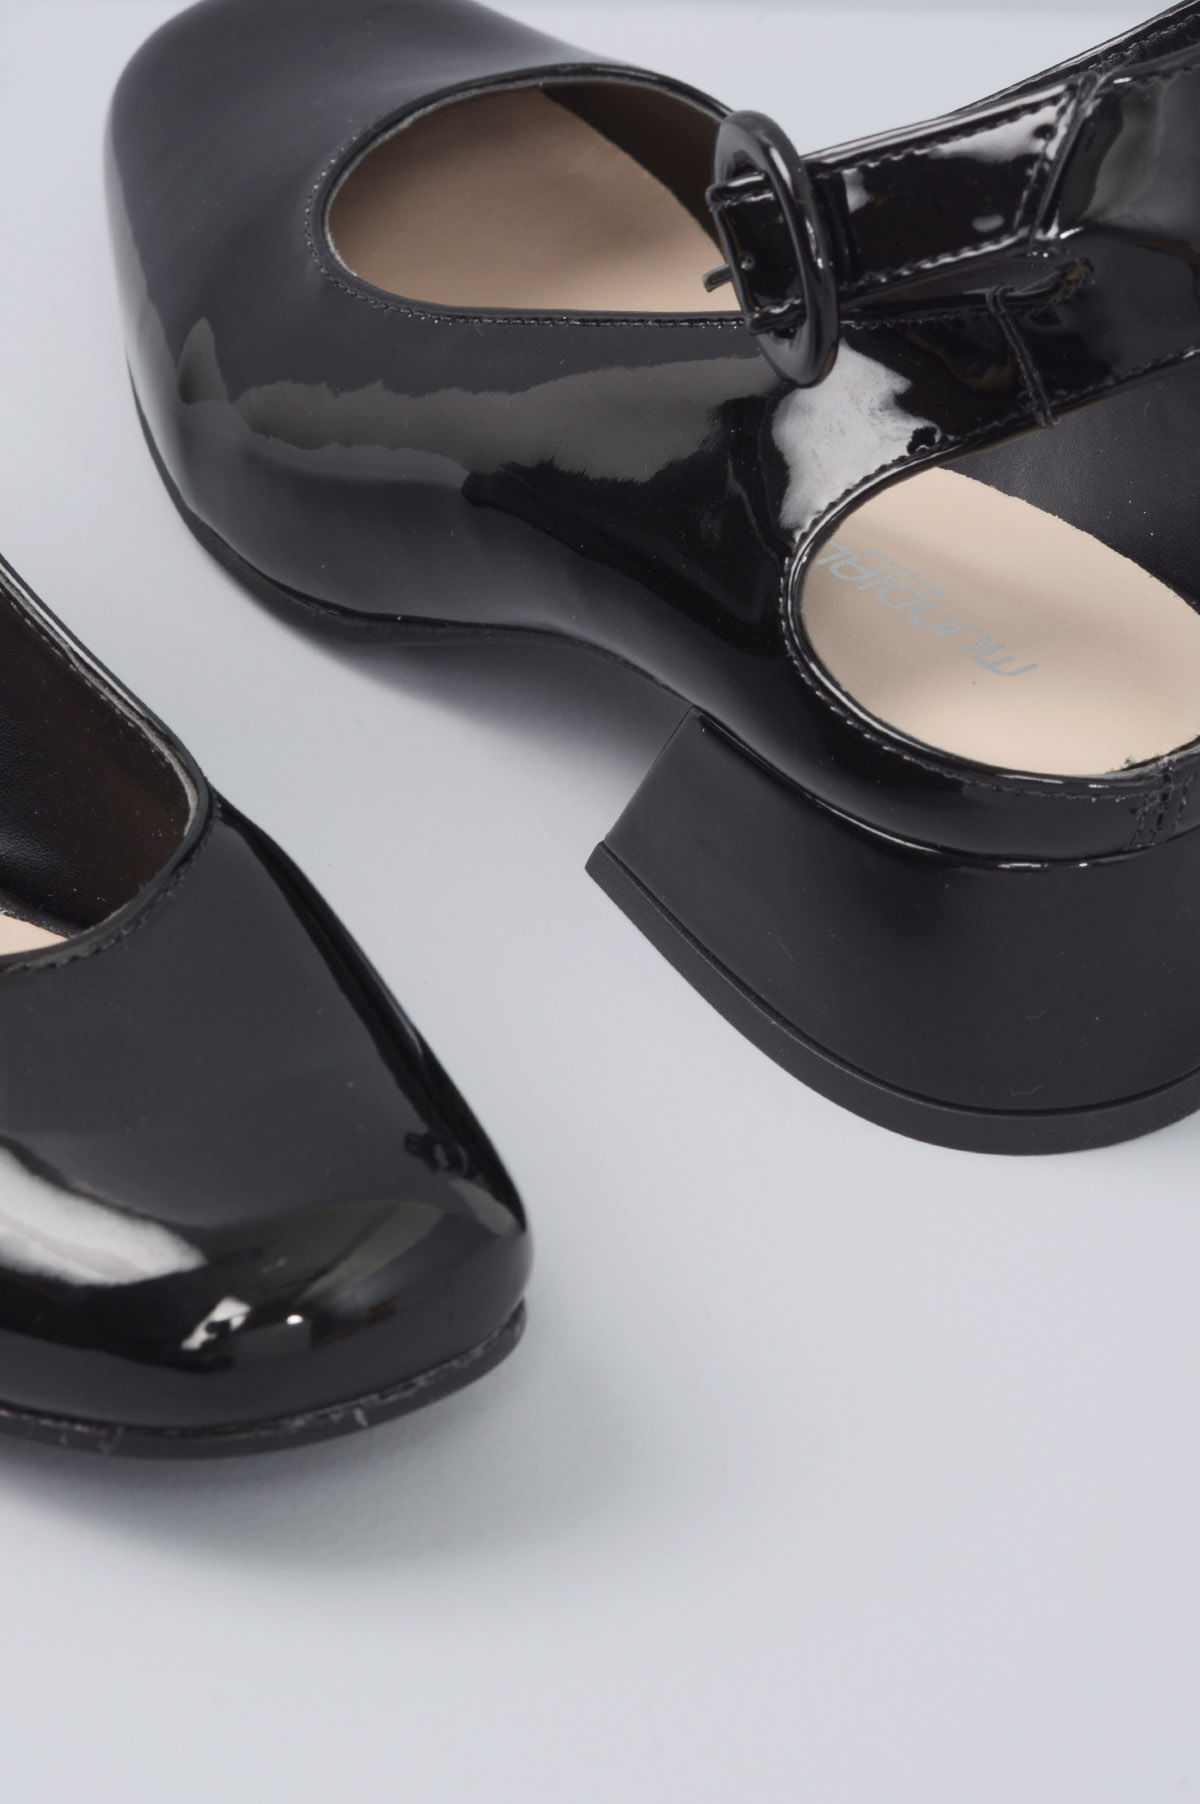 bda932ee5f Sapato Feminino Salto Baixo Margot Mundial VERNIZ PRETO - Mundial ...